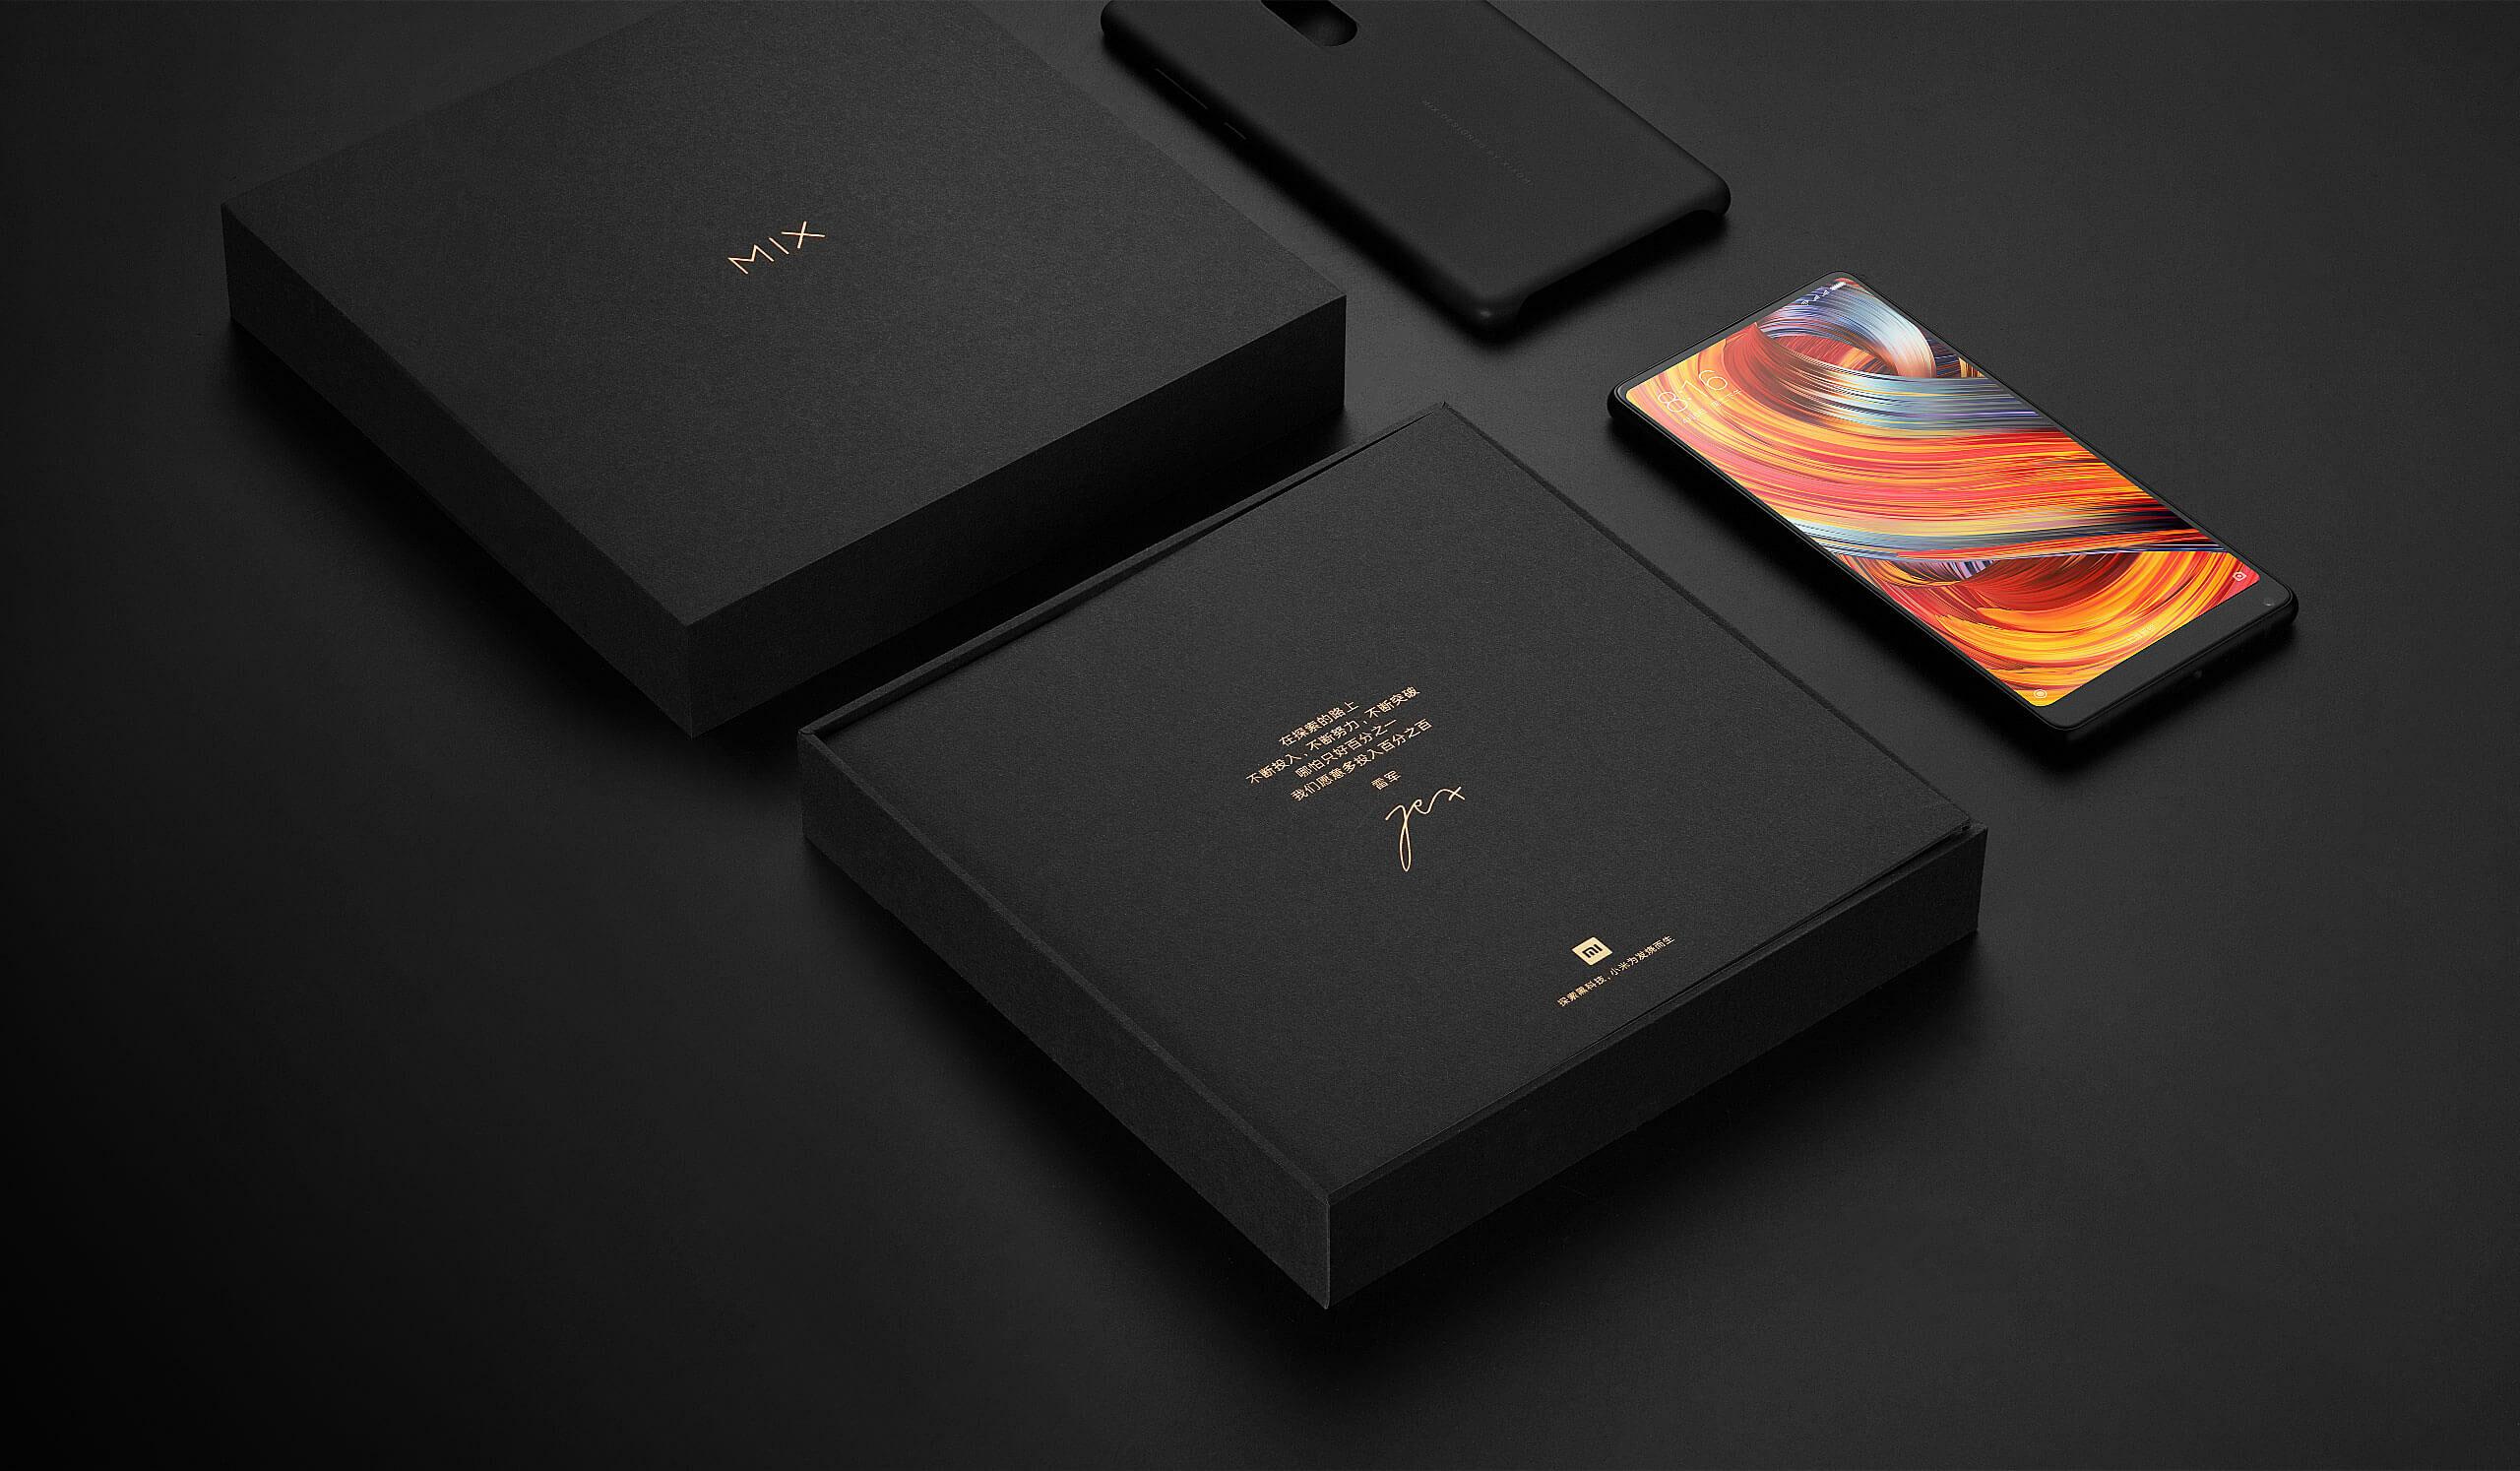 Xiaomi Mi Mix 2 Smartphone Ram 8 Gb